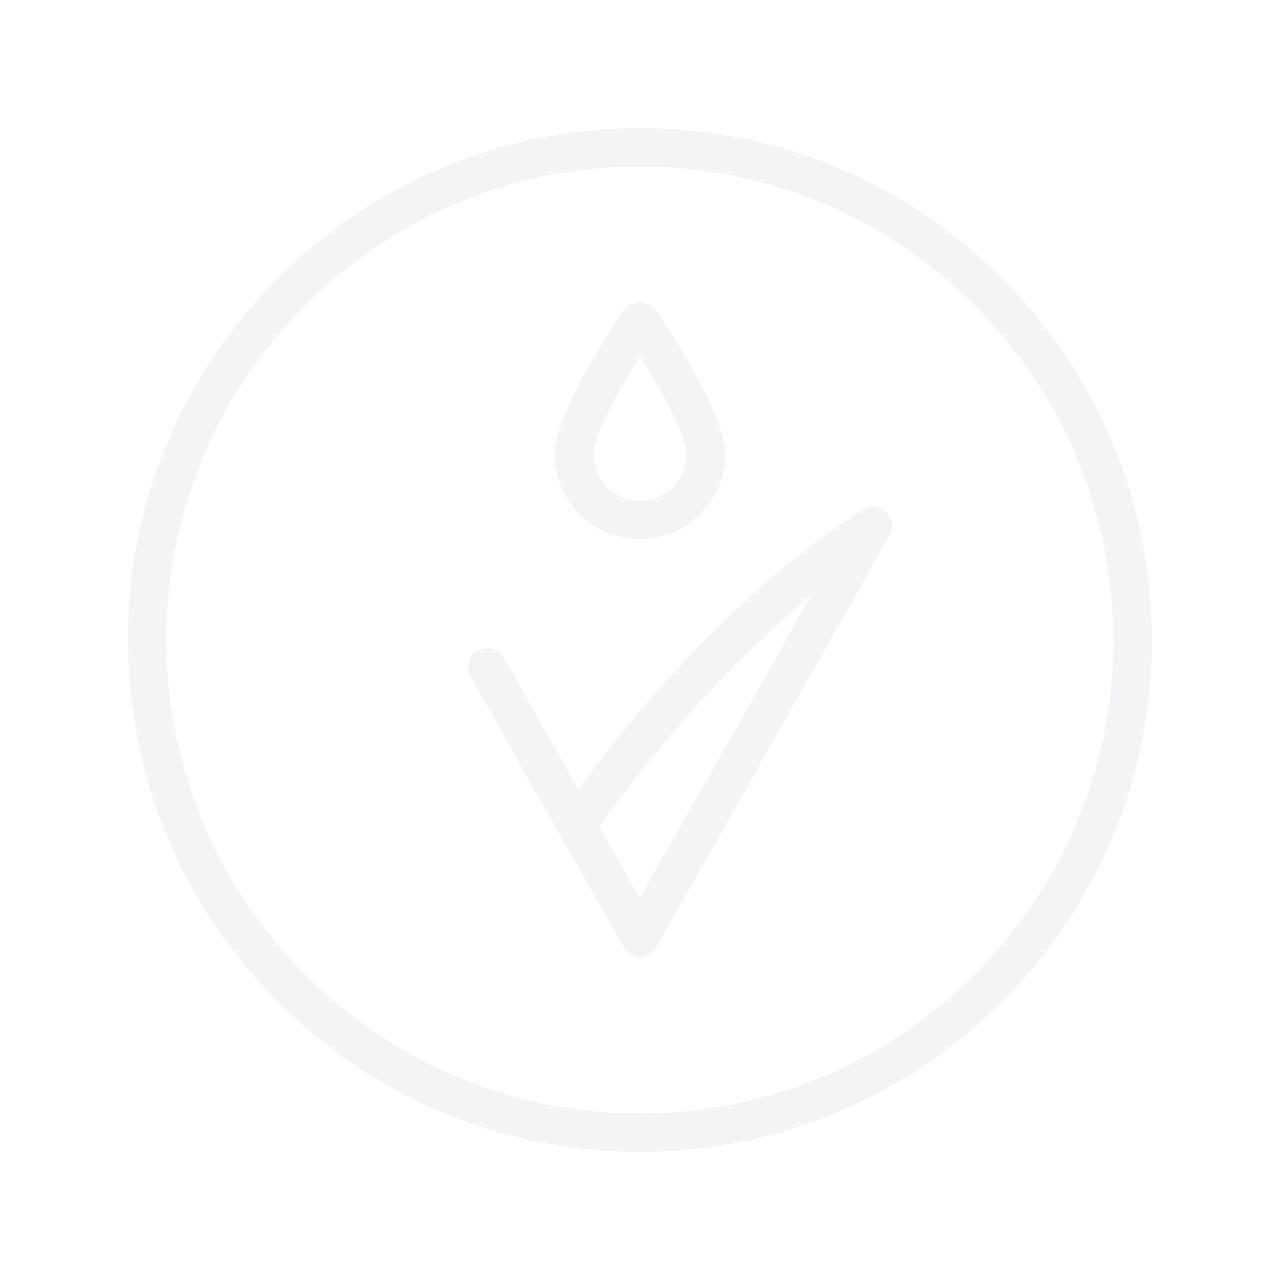 Clarins Instant Light Natural Lip Perfector No. 04 Petal Shimmer 12ml